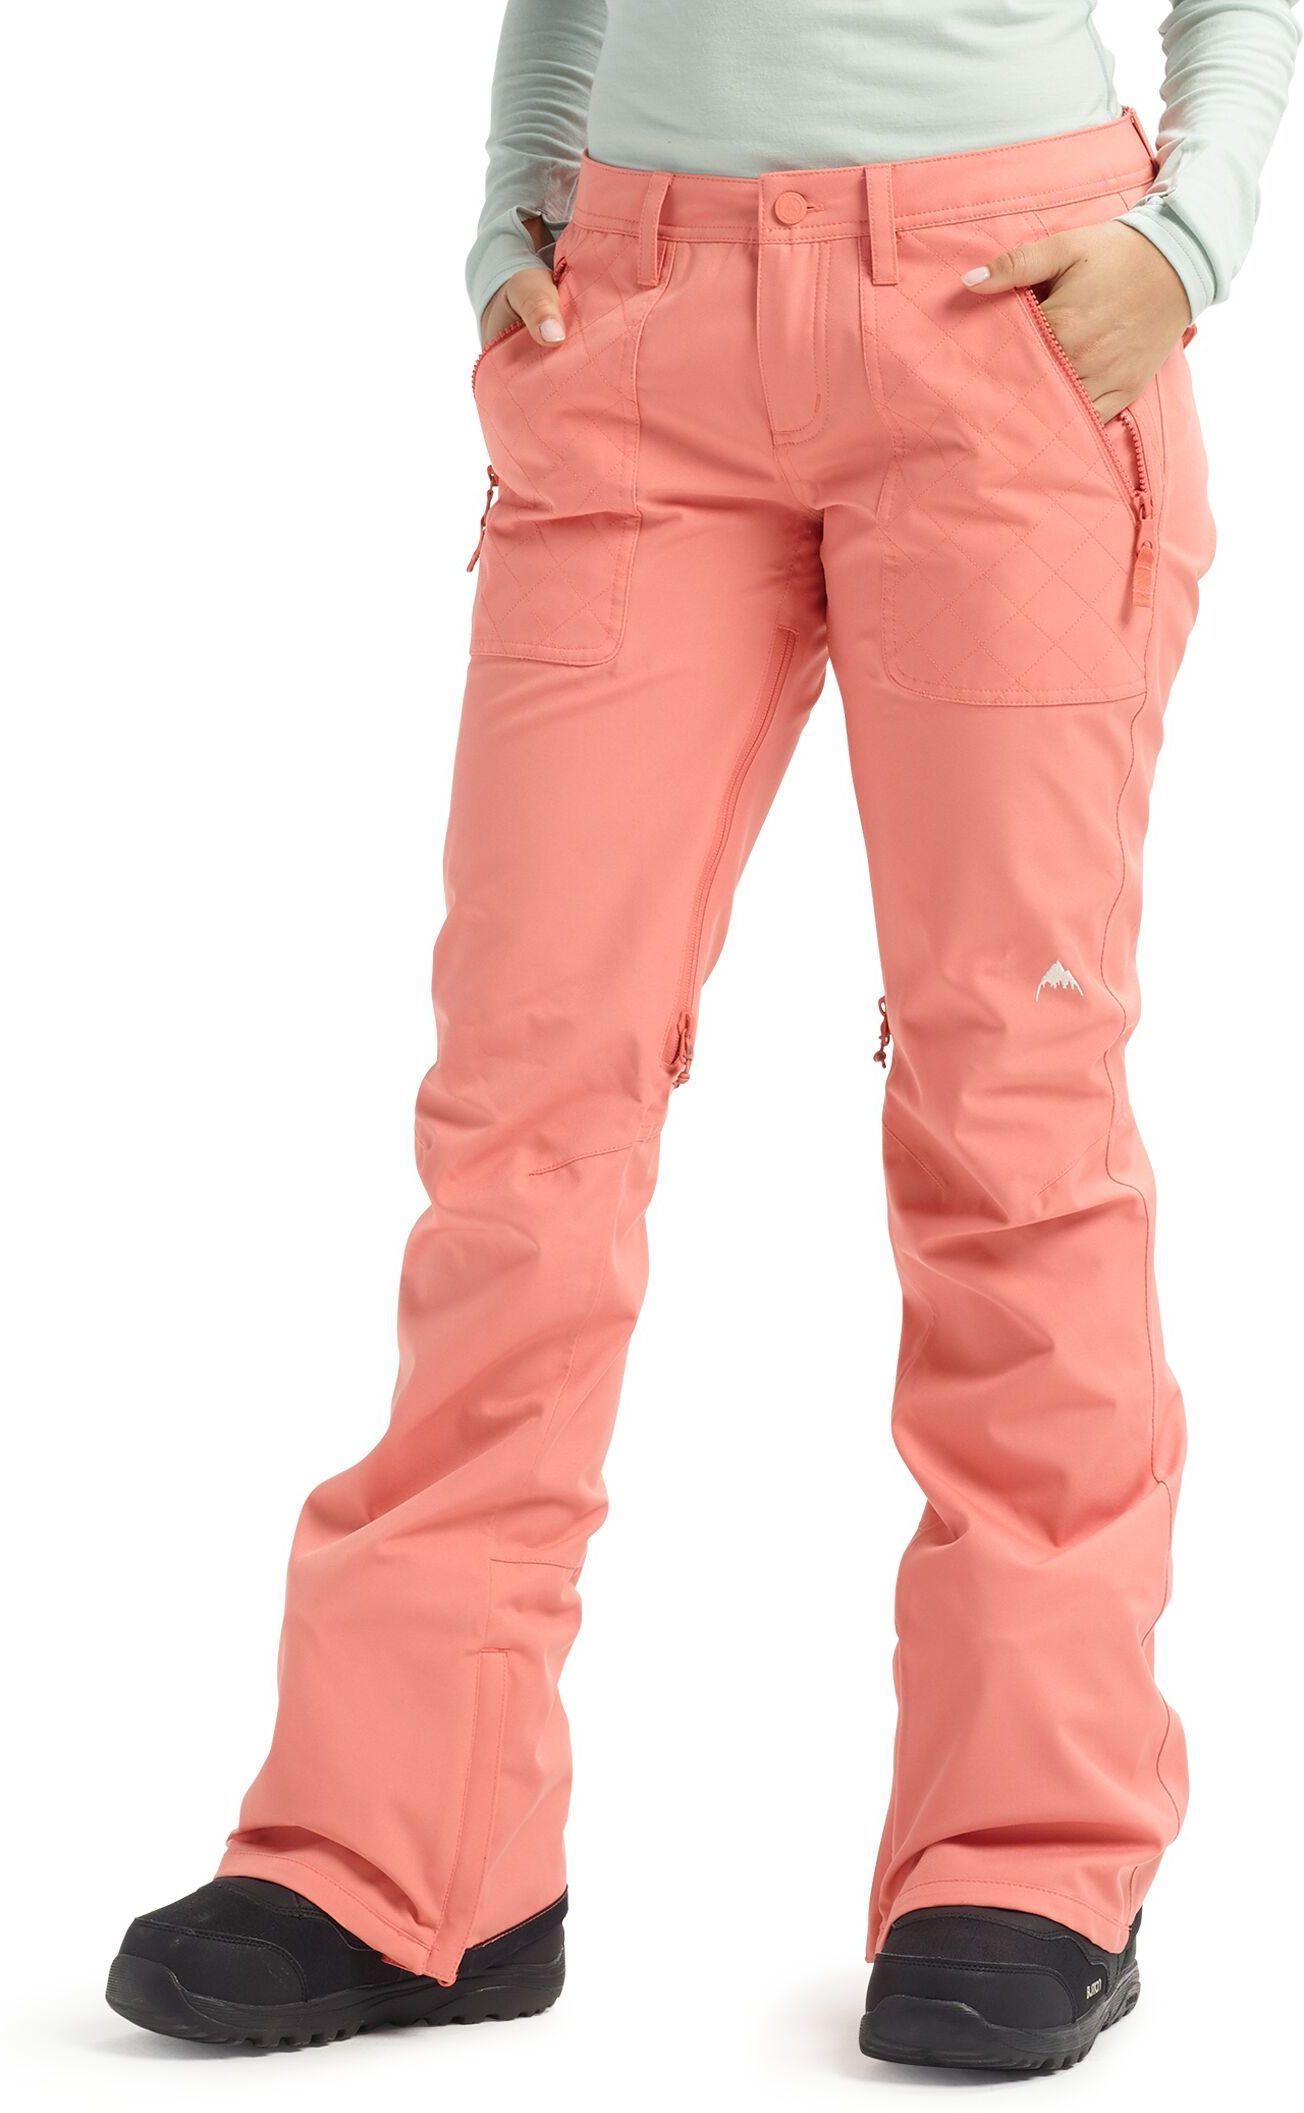 zimowe spodnie damskie BURTON VIDA PT Crabapple